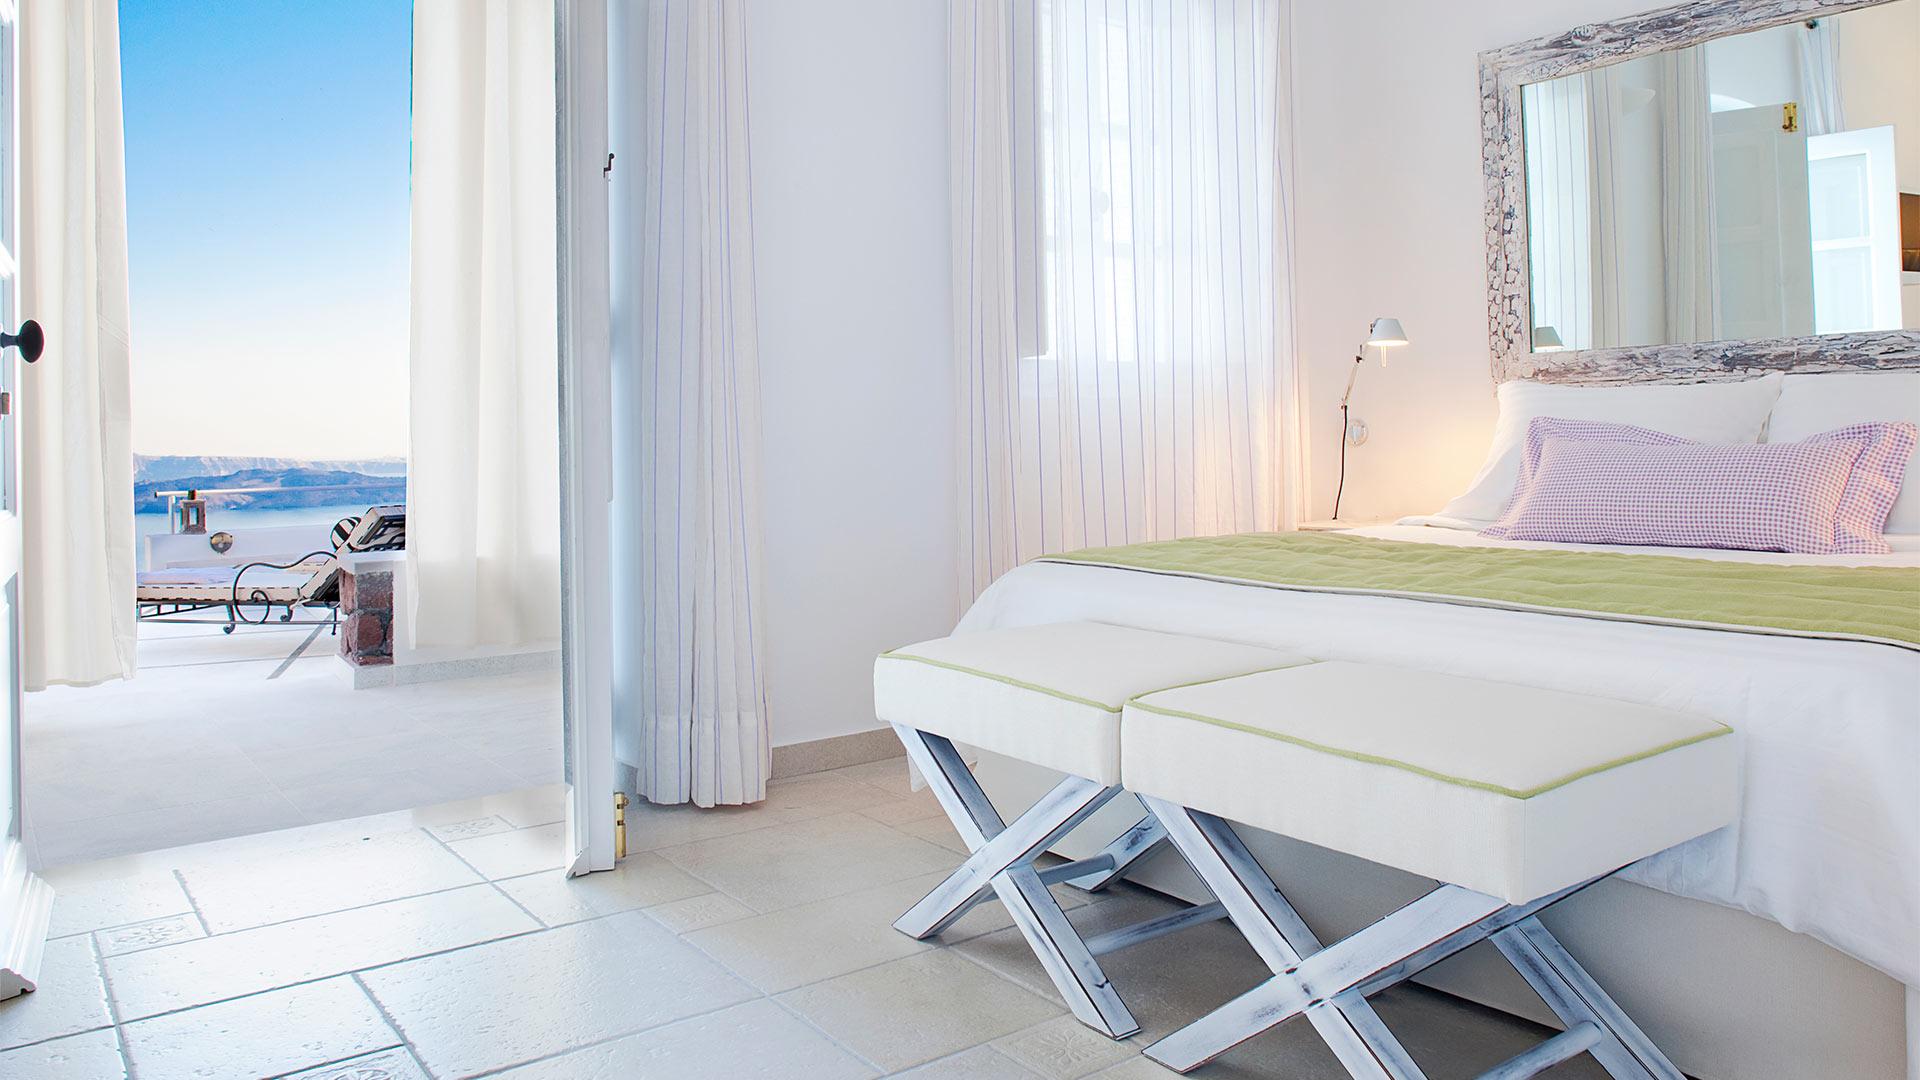 San antonio luxury hotel   santorini   grækenland